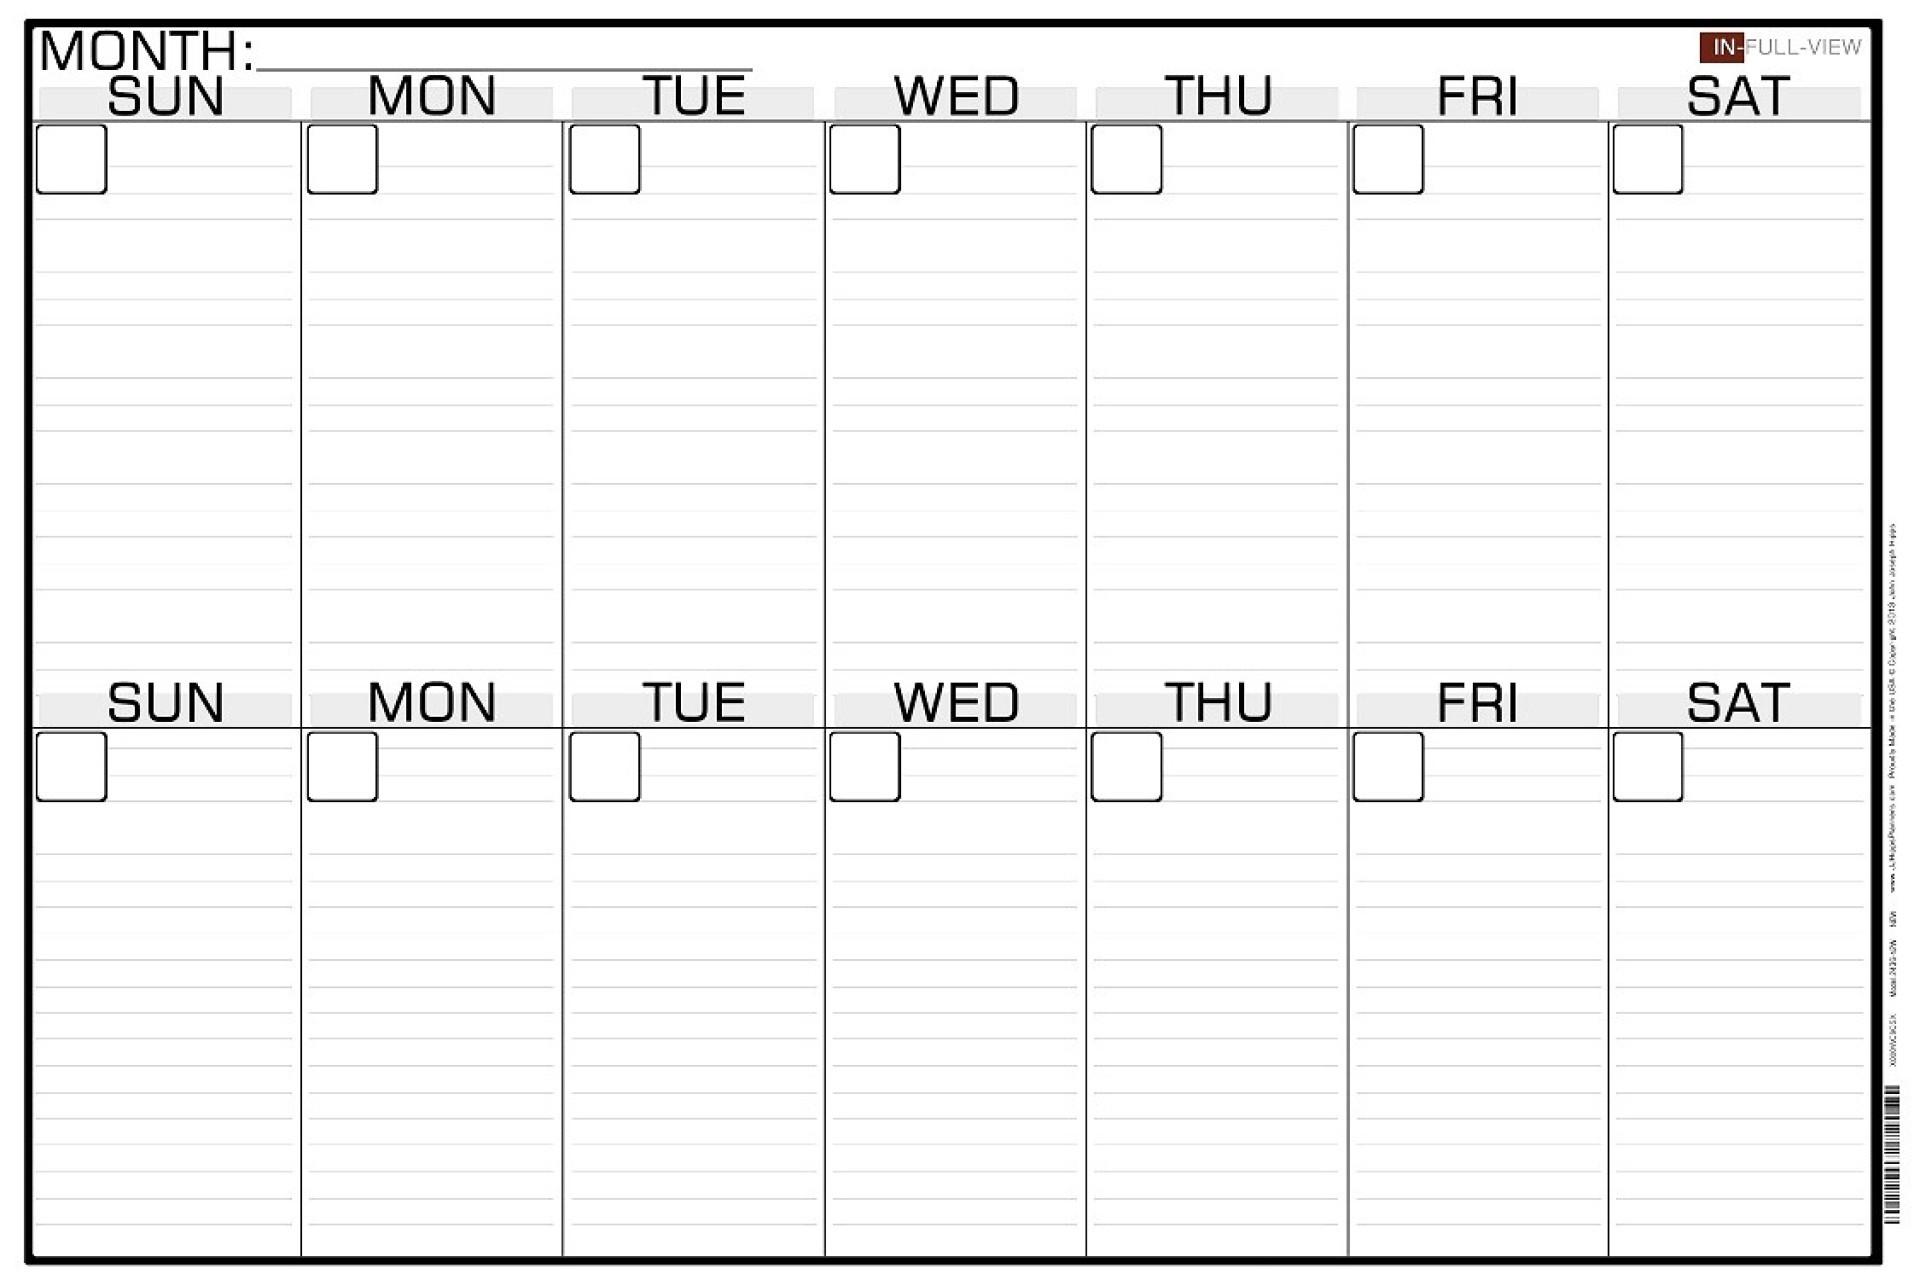 002 Template Ideas Printable Week Calendar For Two-Two Week Schedule Template